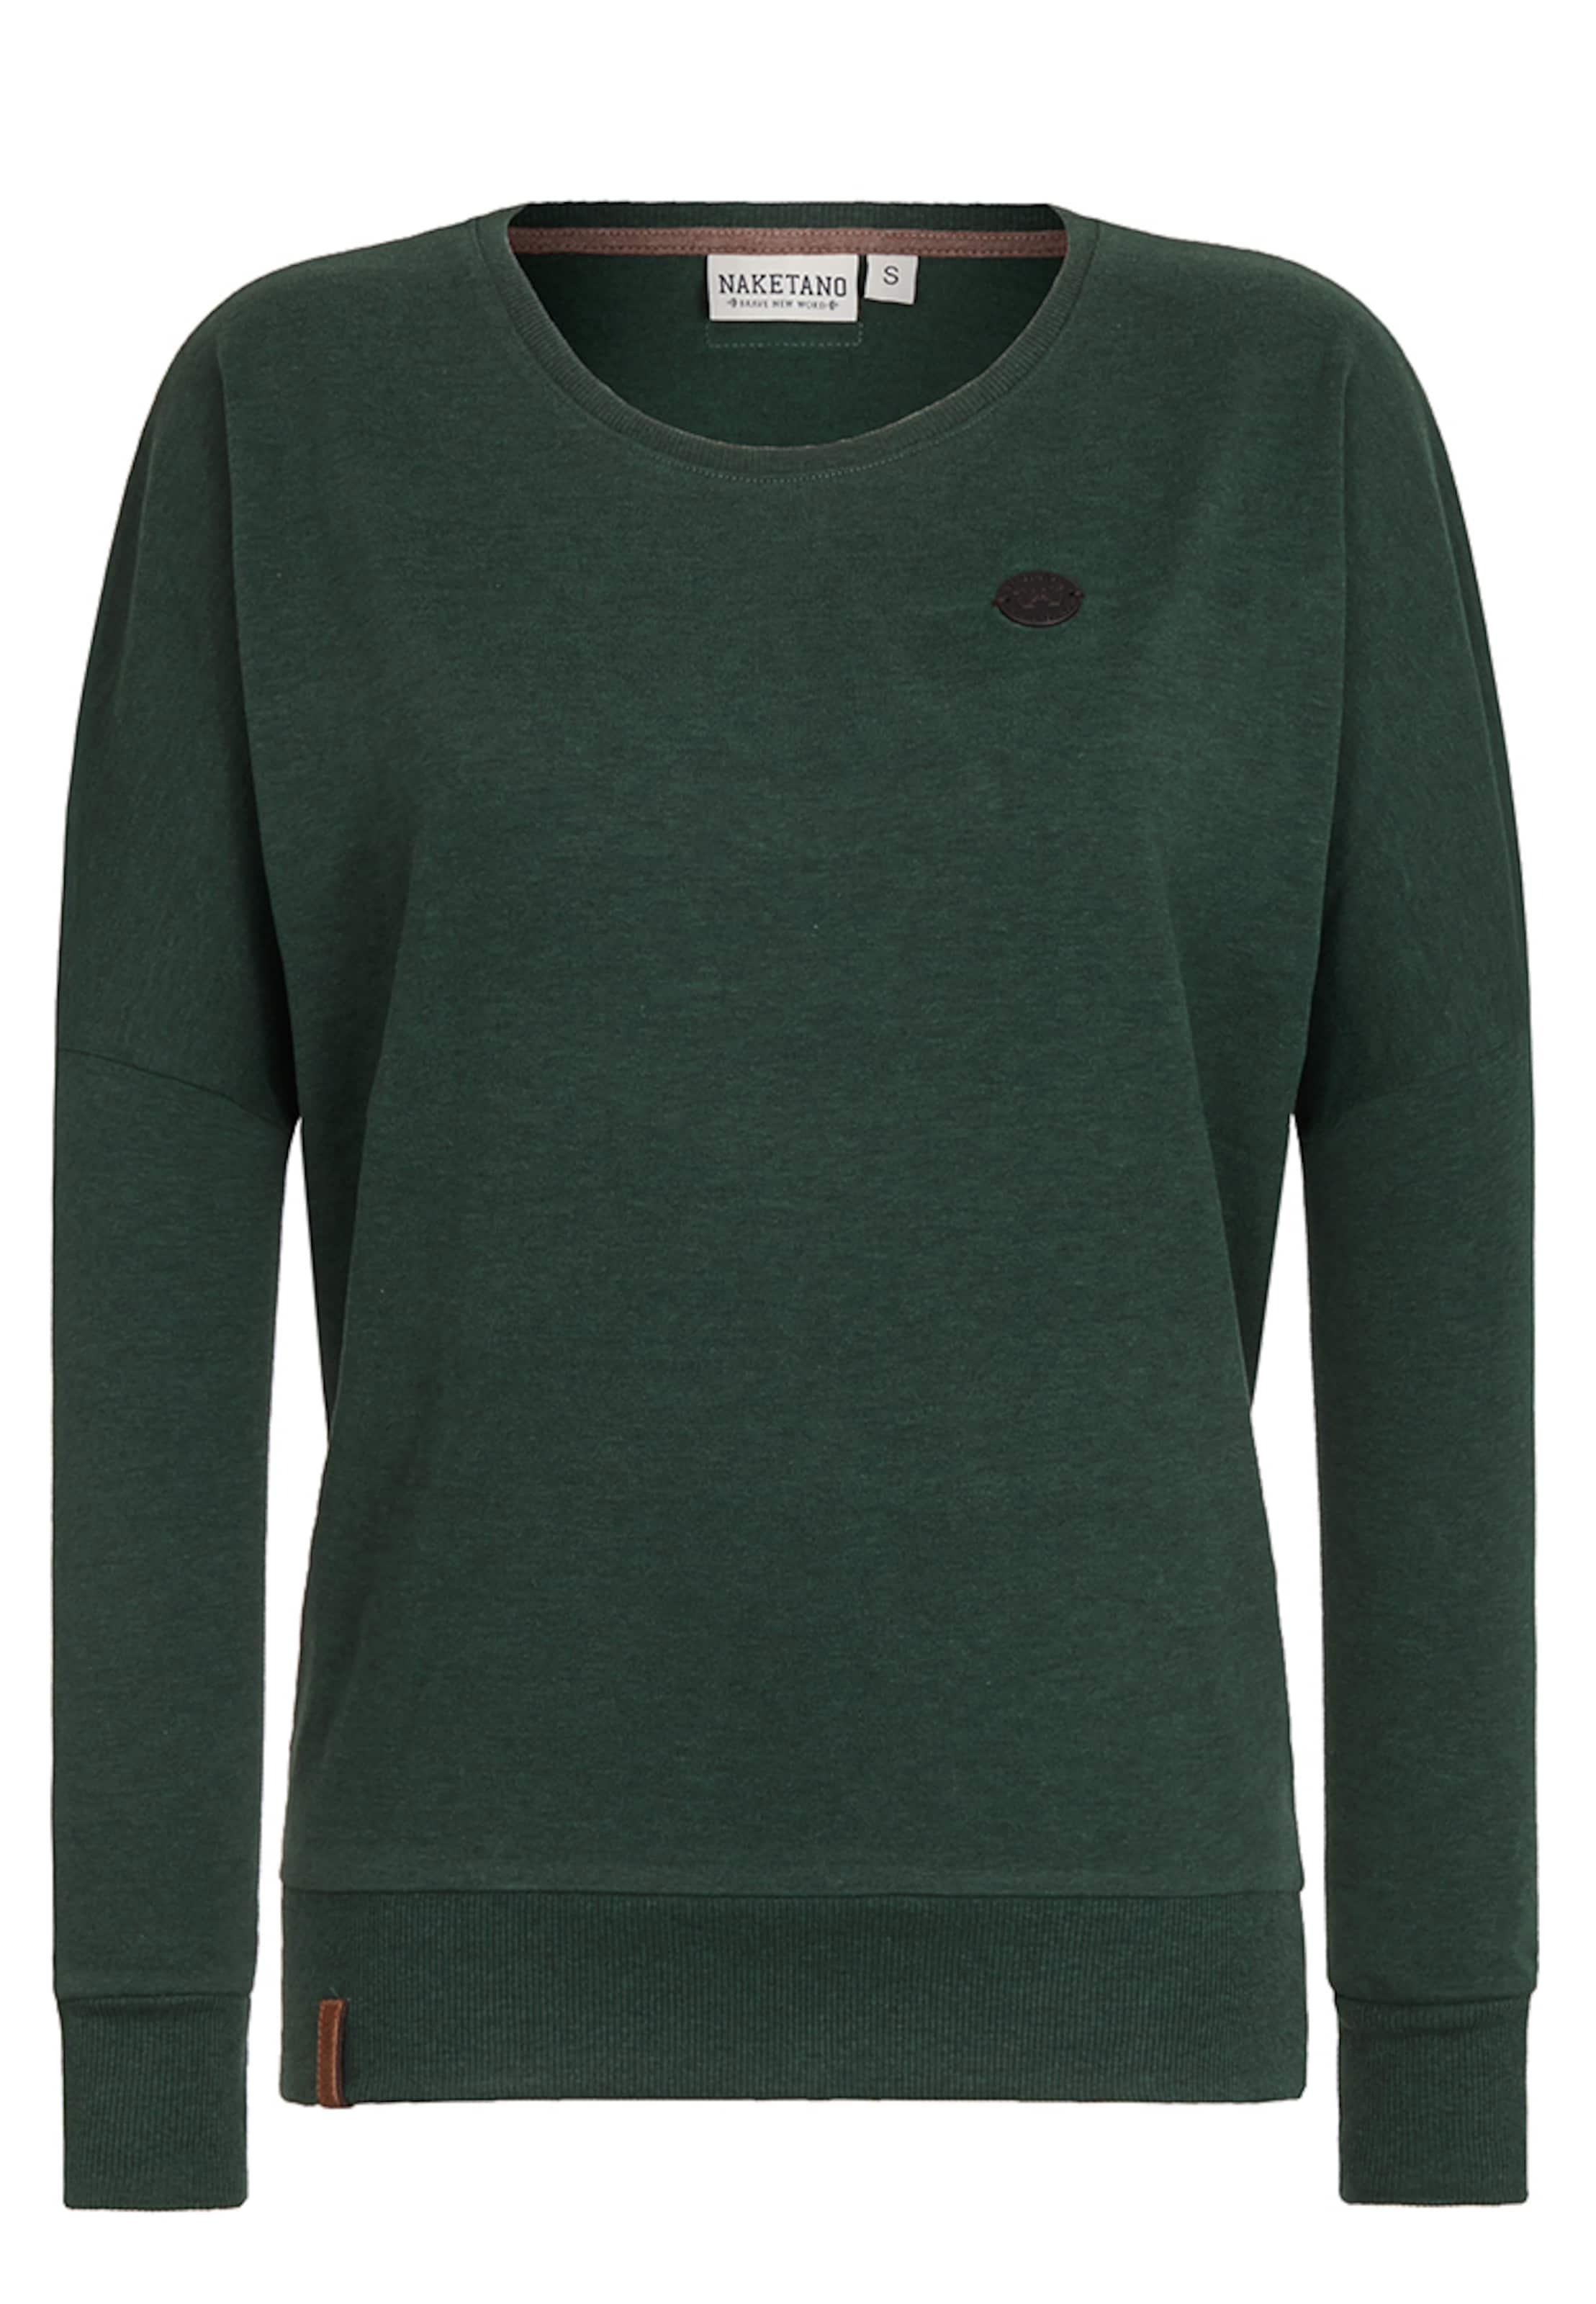 naketano Sweatshirt 'Green Schmusi' Günstig Kaufen Shop GcqUd2